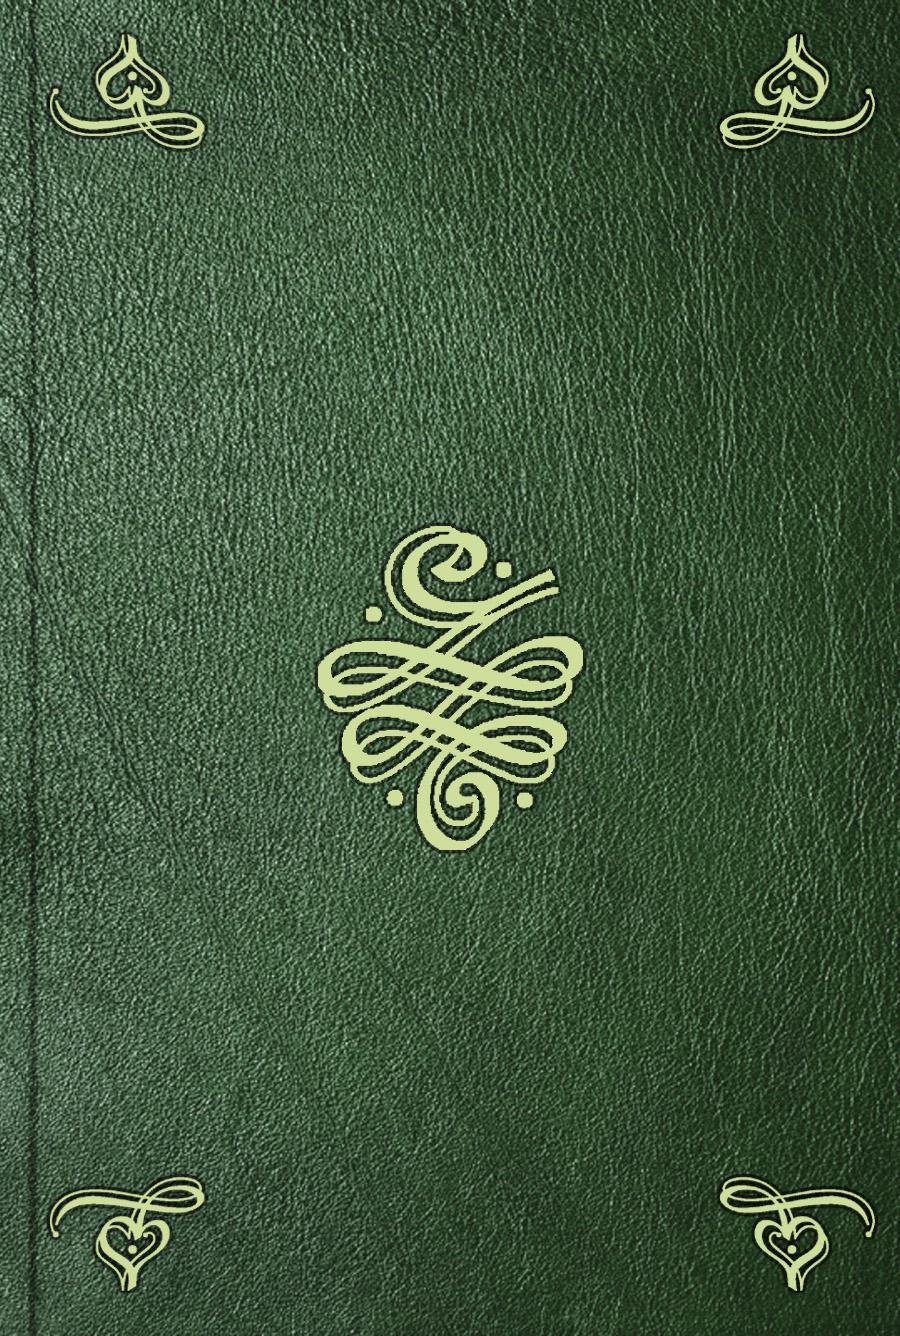 цены Zoroastre Zend-Avesta, ouvrage de Zoroastre. T. 2